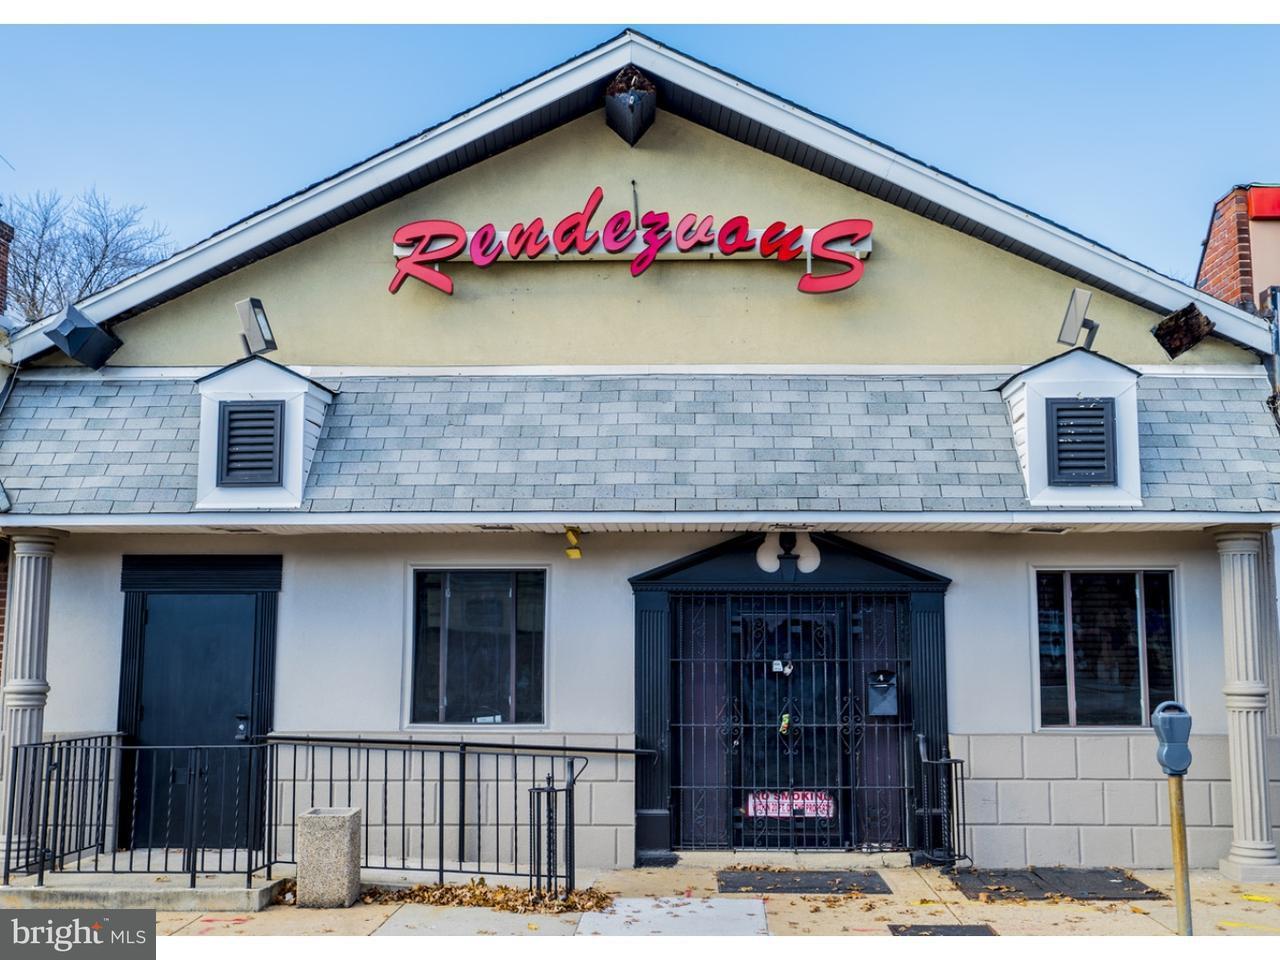 6328  Rising Sun Philadelphia, PA 19111